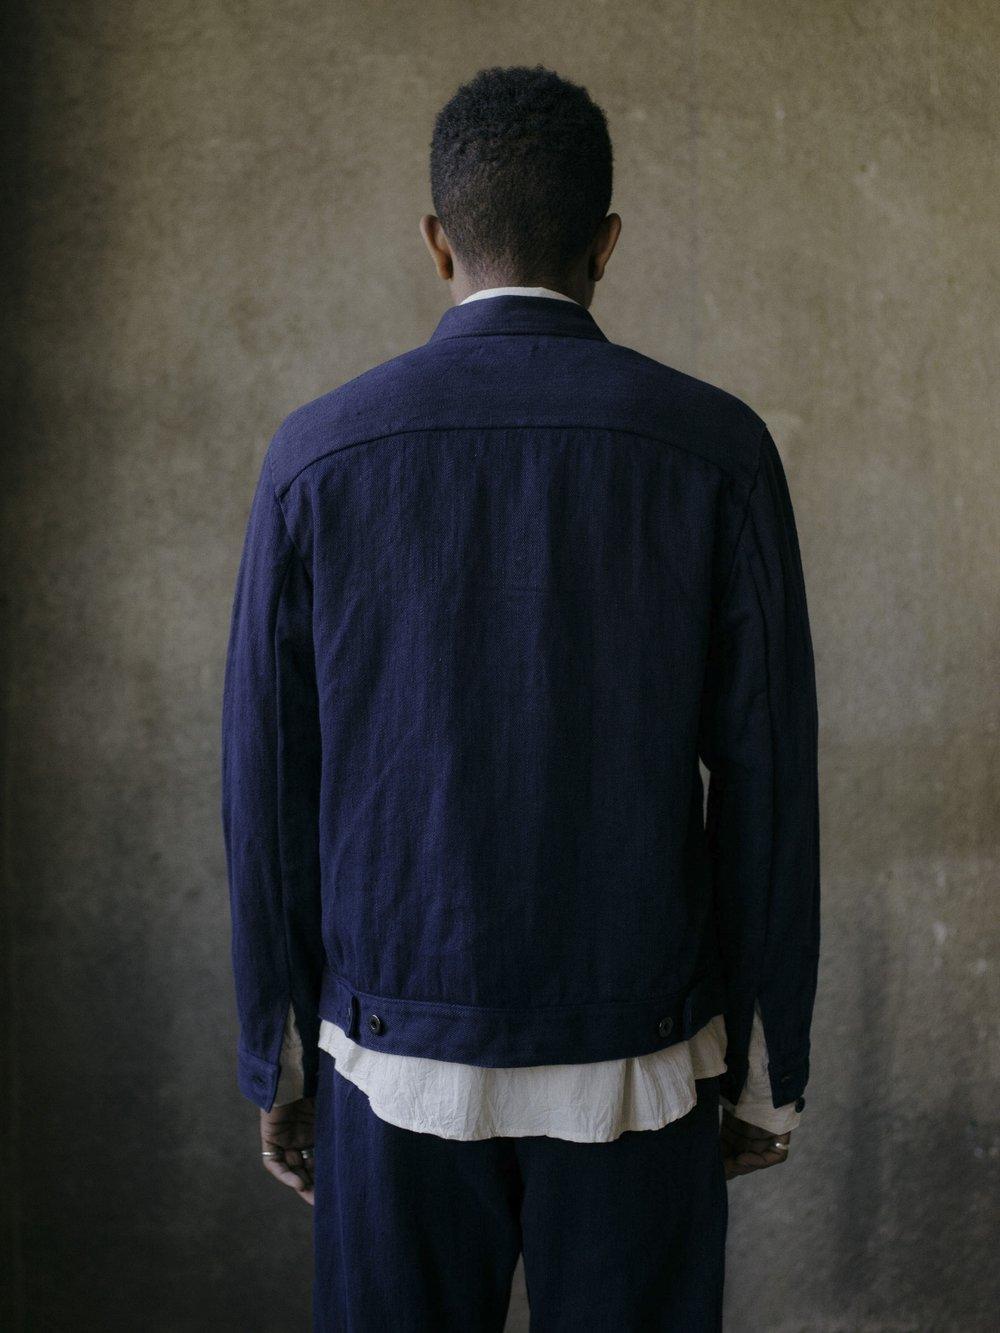 evan-kinori-pleated-jacket-french-blue-hemp-twill-5